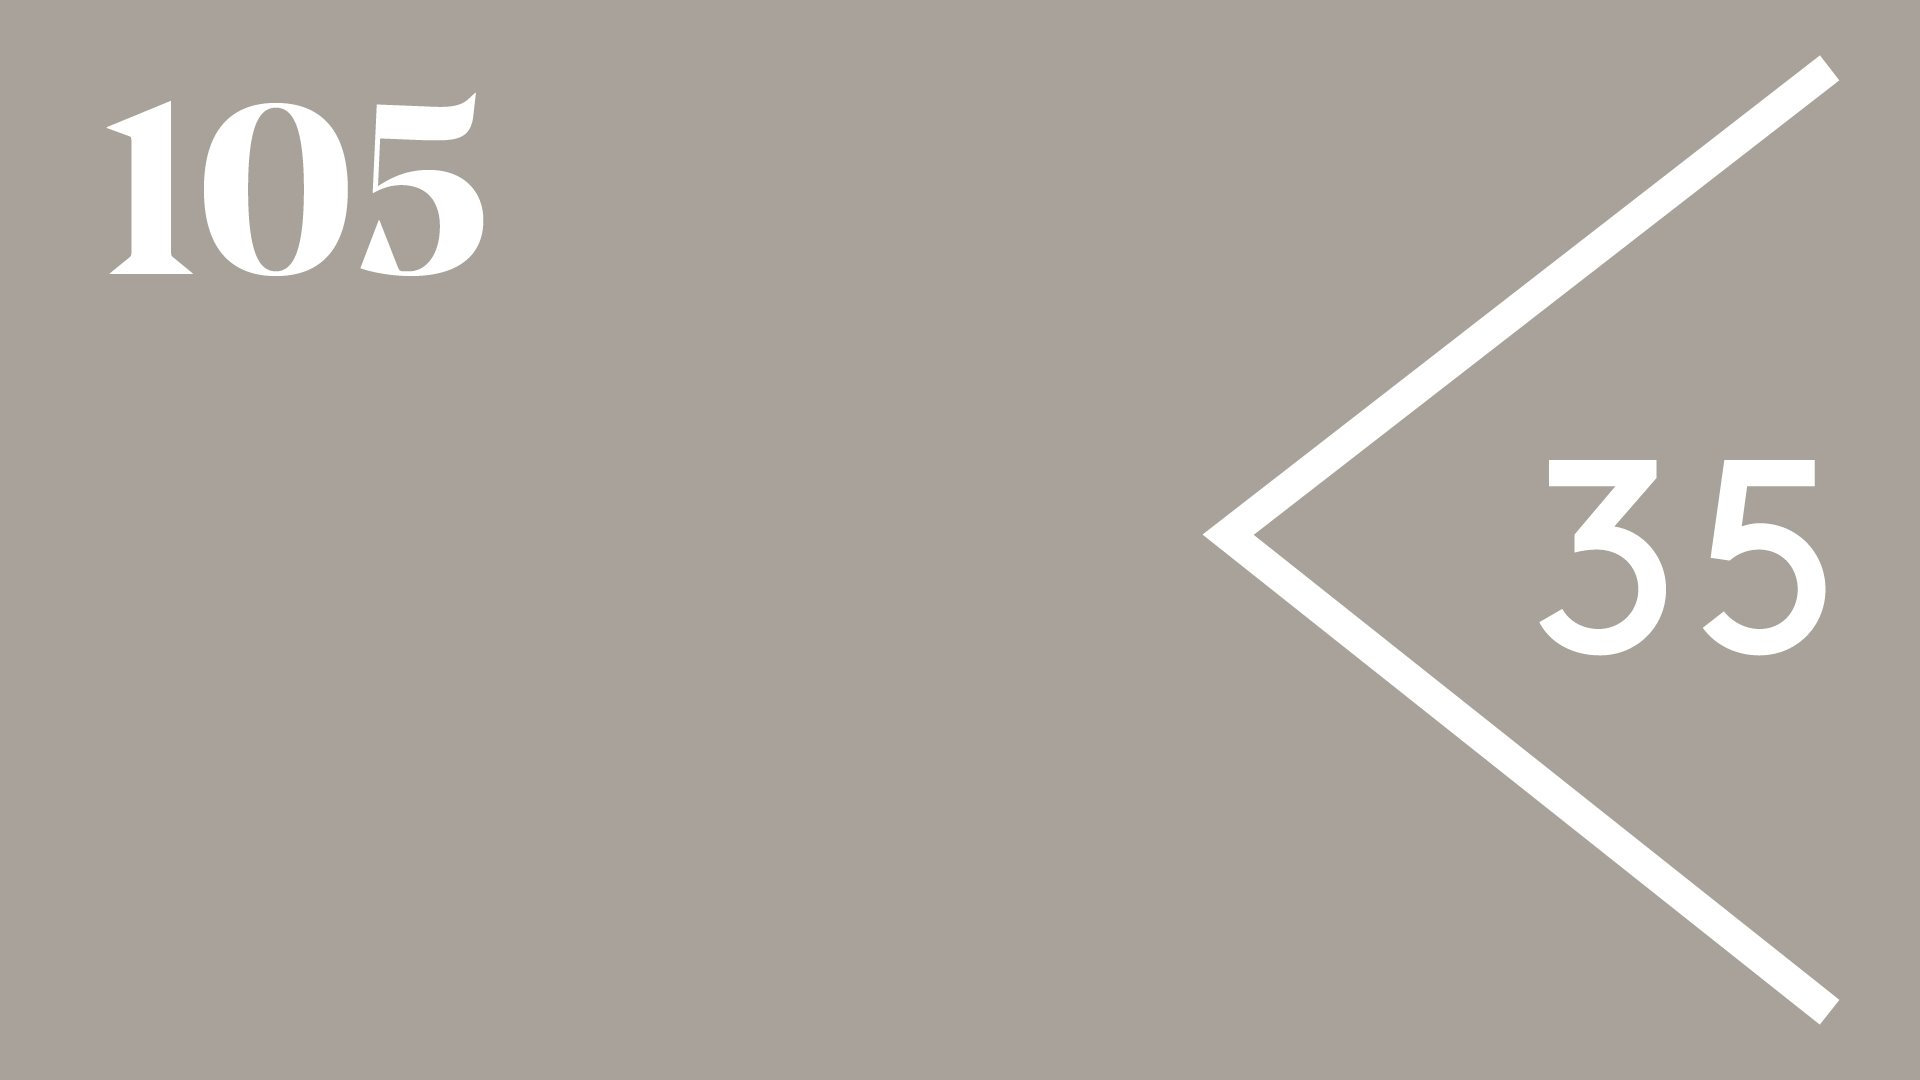 Aula de (Re)estrenos (105). Compositores Sub-35 (VII)